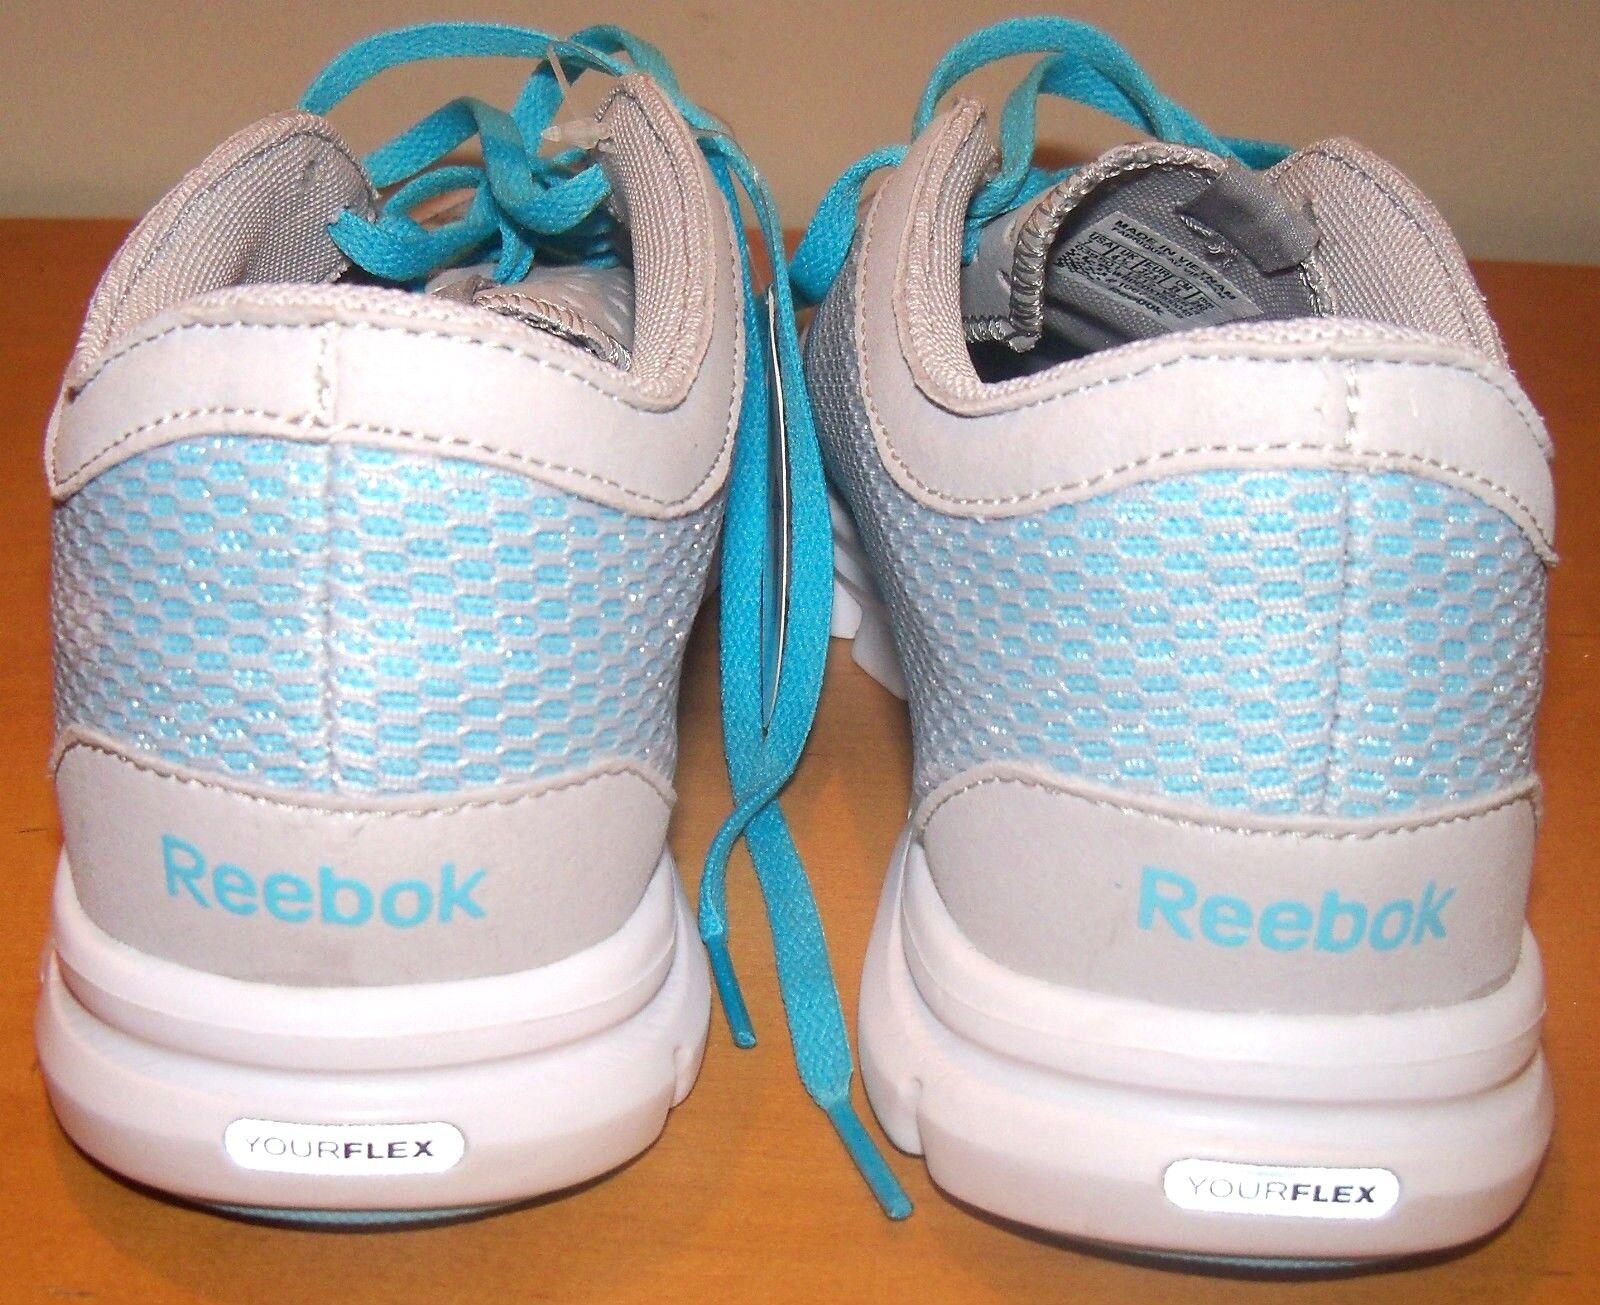 Reebok Sz 11 Damen Laufschuh Sneakers - Leicht SHO-10 - Ortholite - NWOB SHO-10 Leicht 19f513